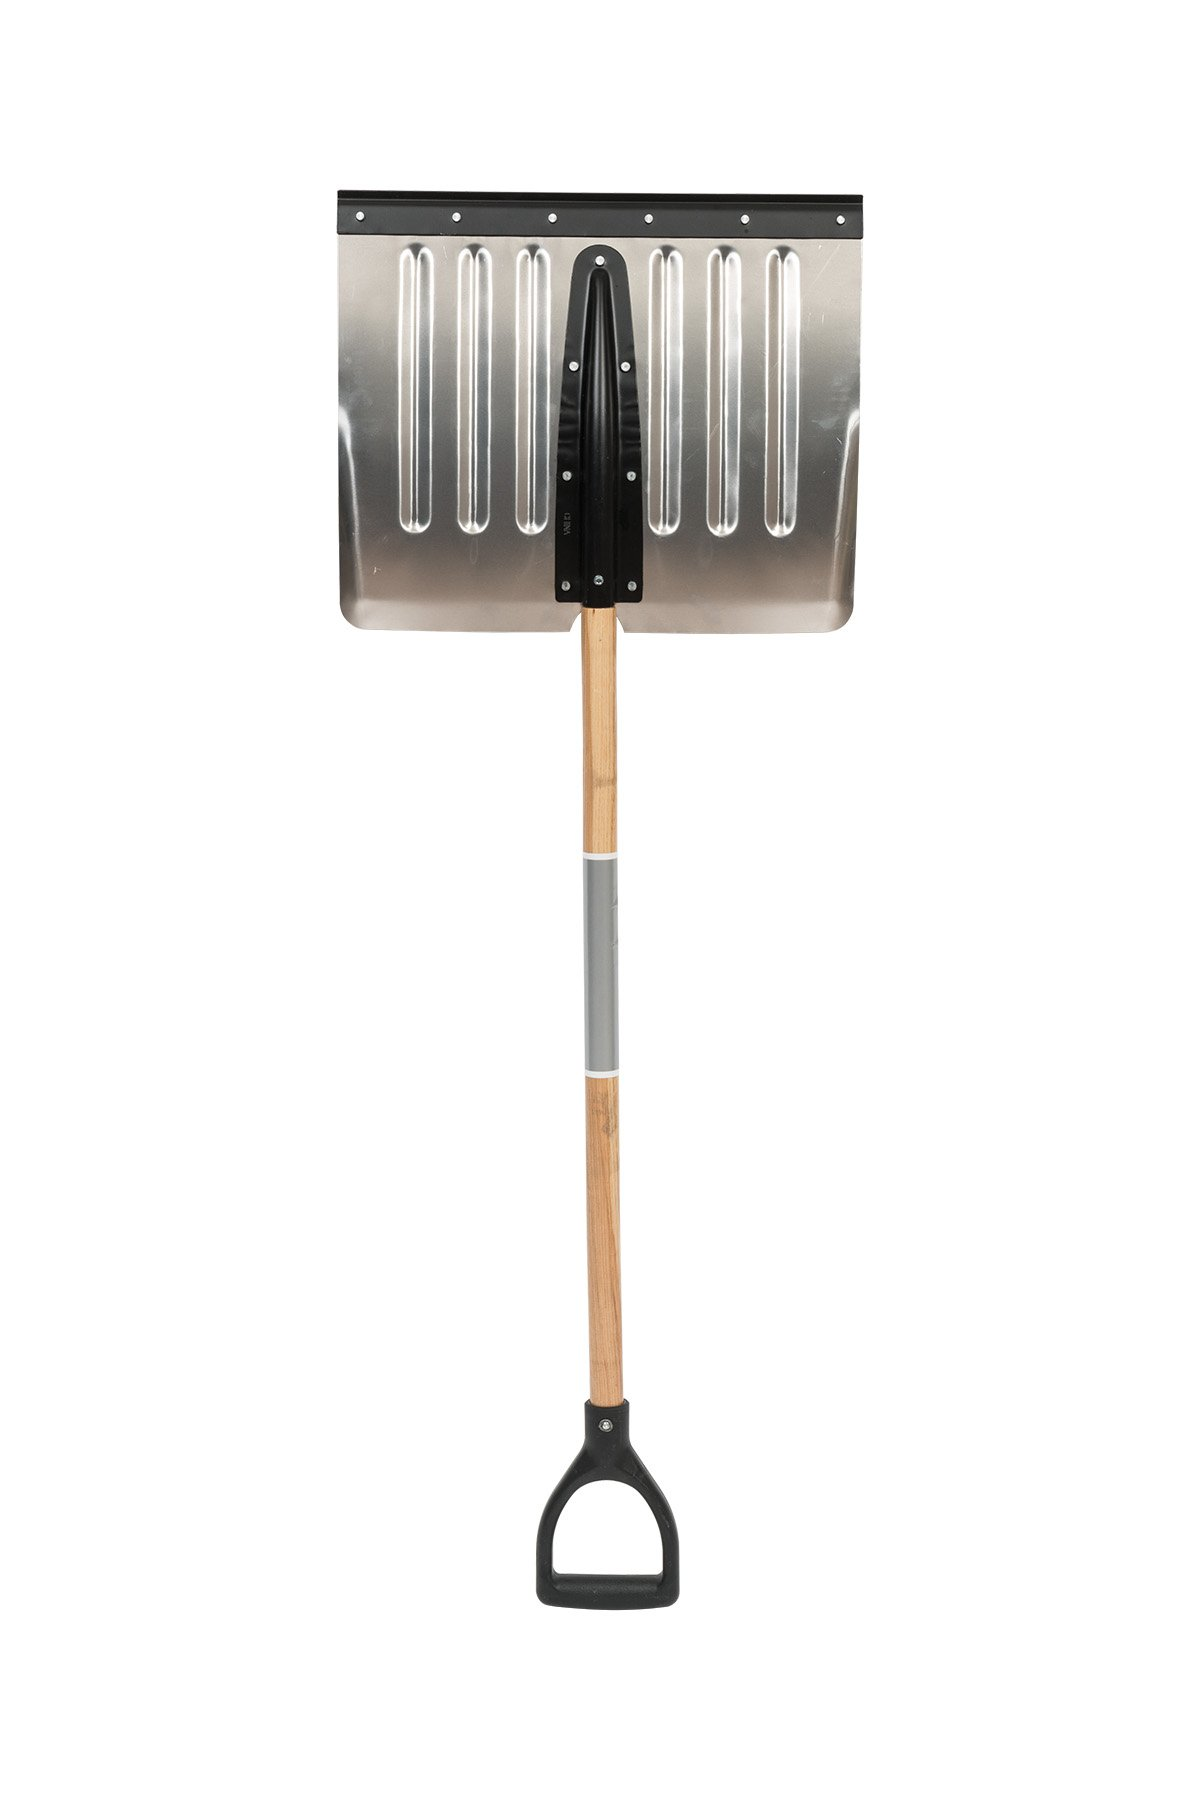 "Seymour SV-SS22 18"" Blade Structron Snow Shovel, 41"" Hardwood Handle, Poly D-Grip"